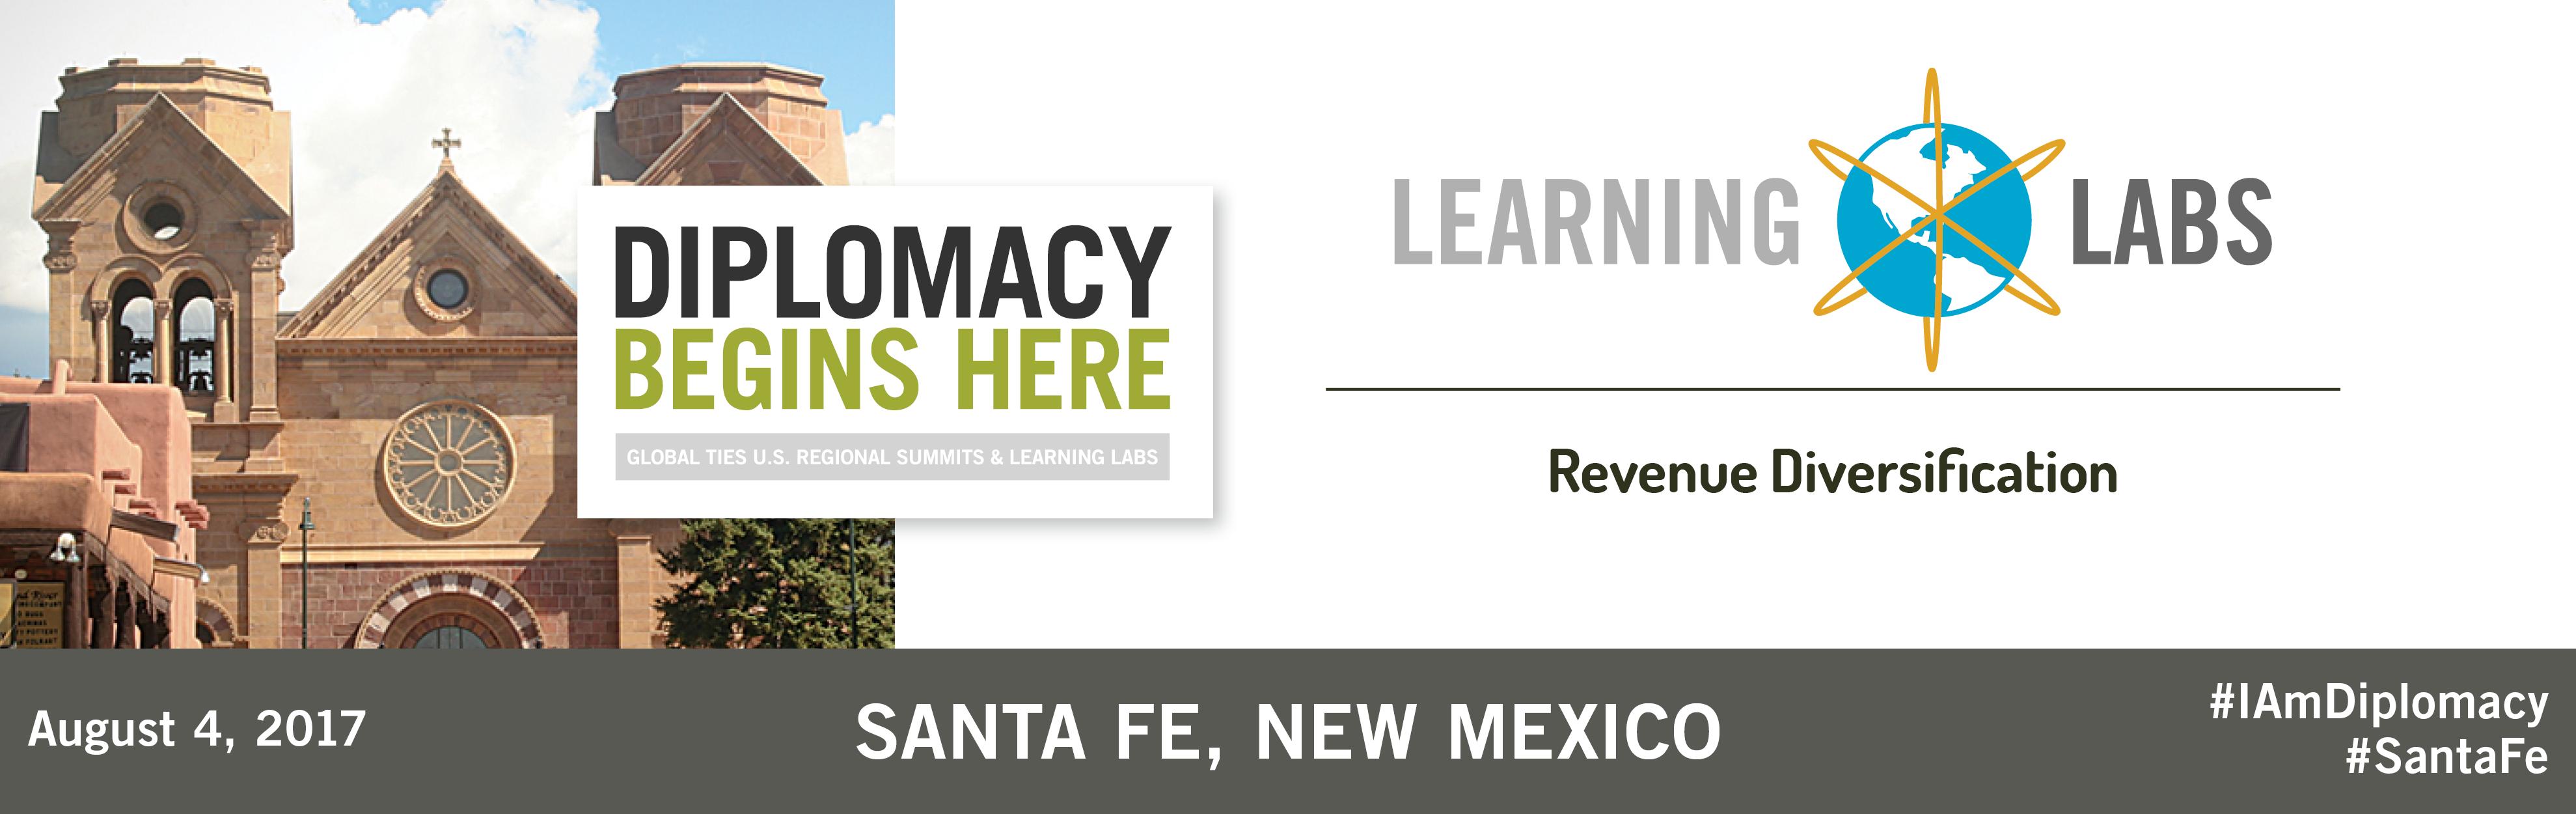 Diplomacy Begins Here: Santa Fe, New Mexico